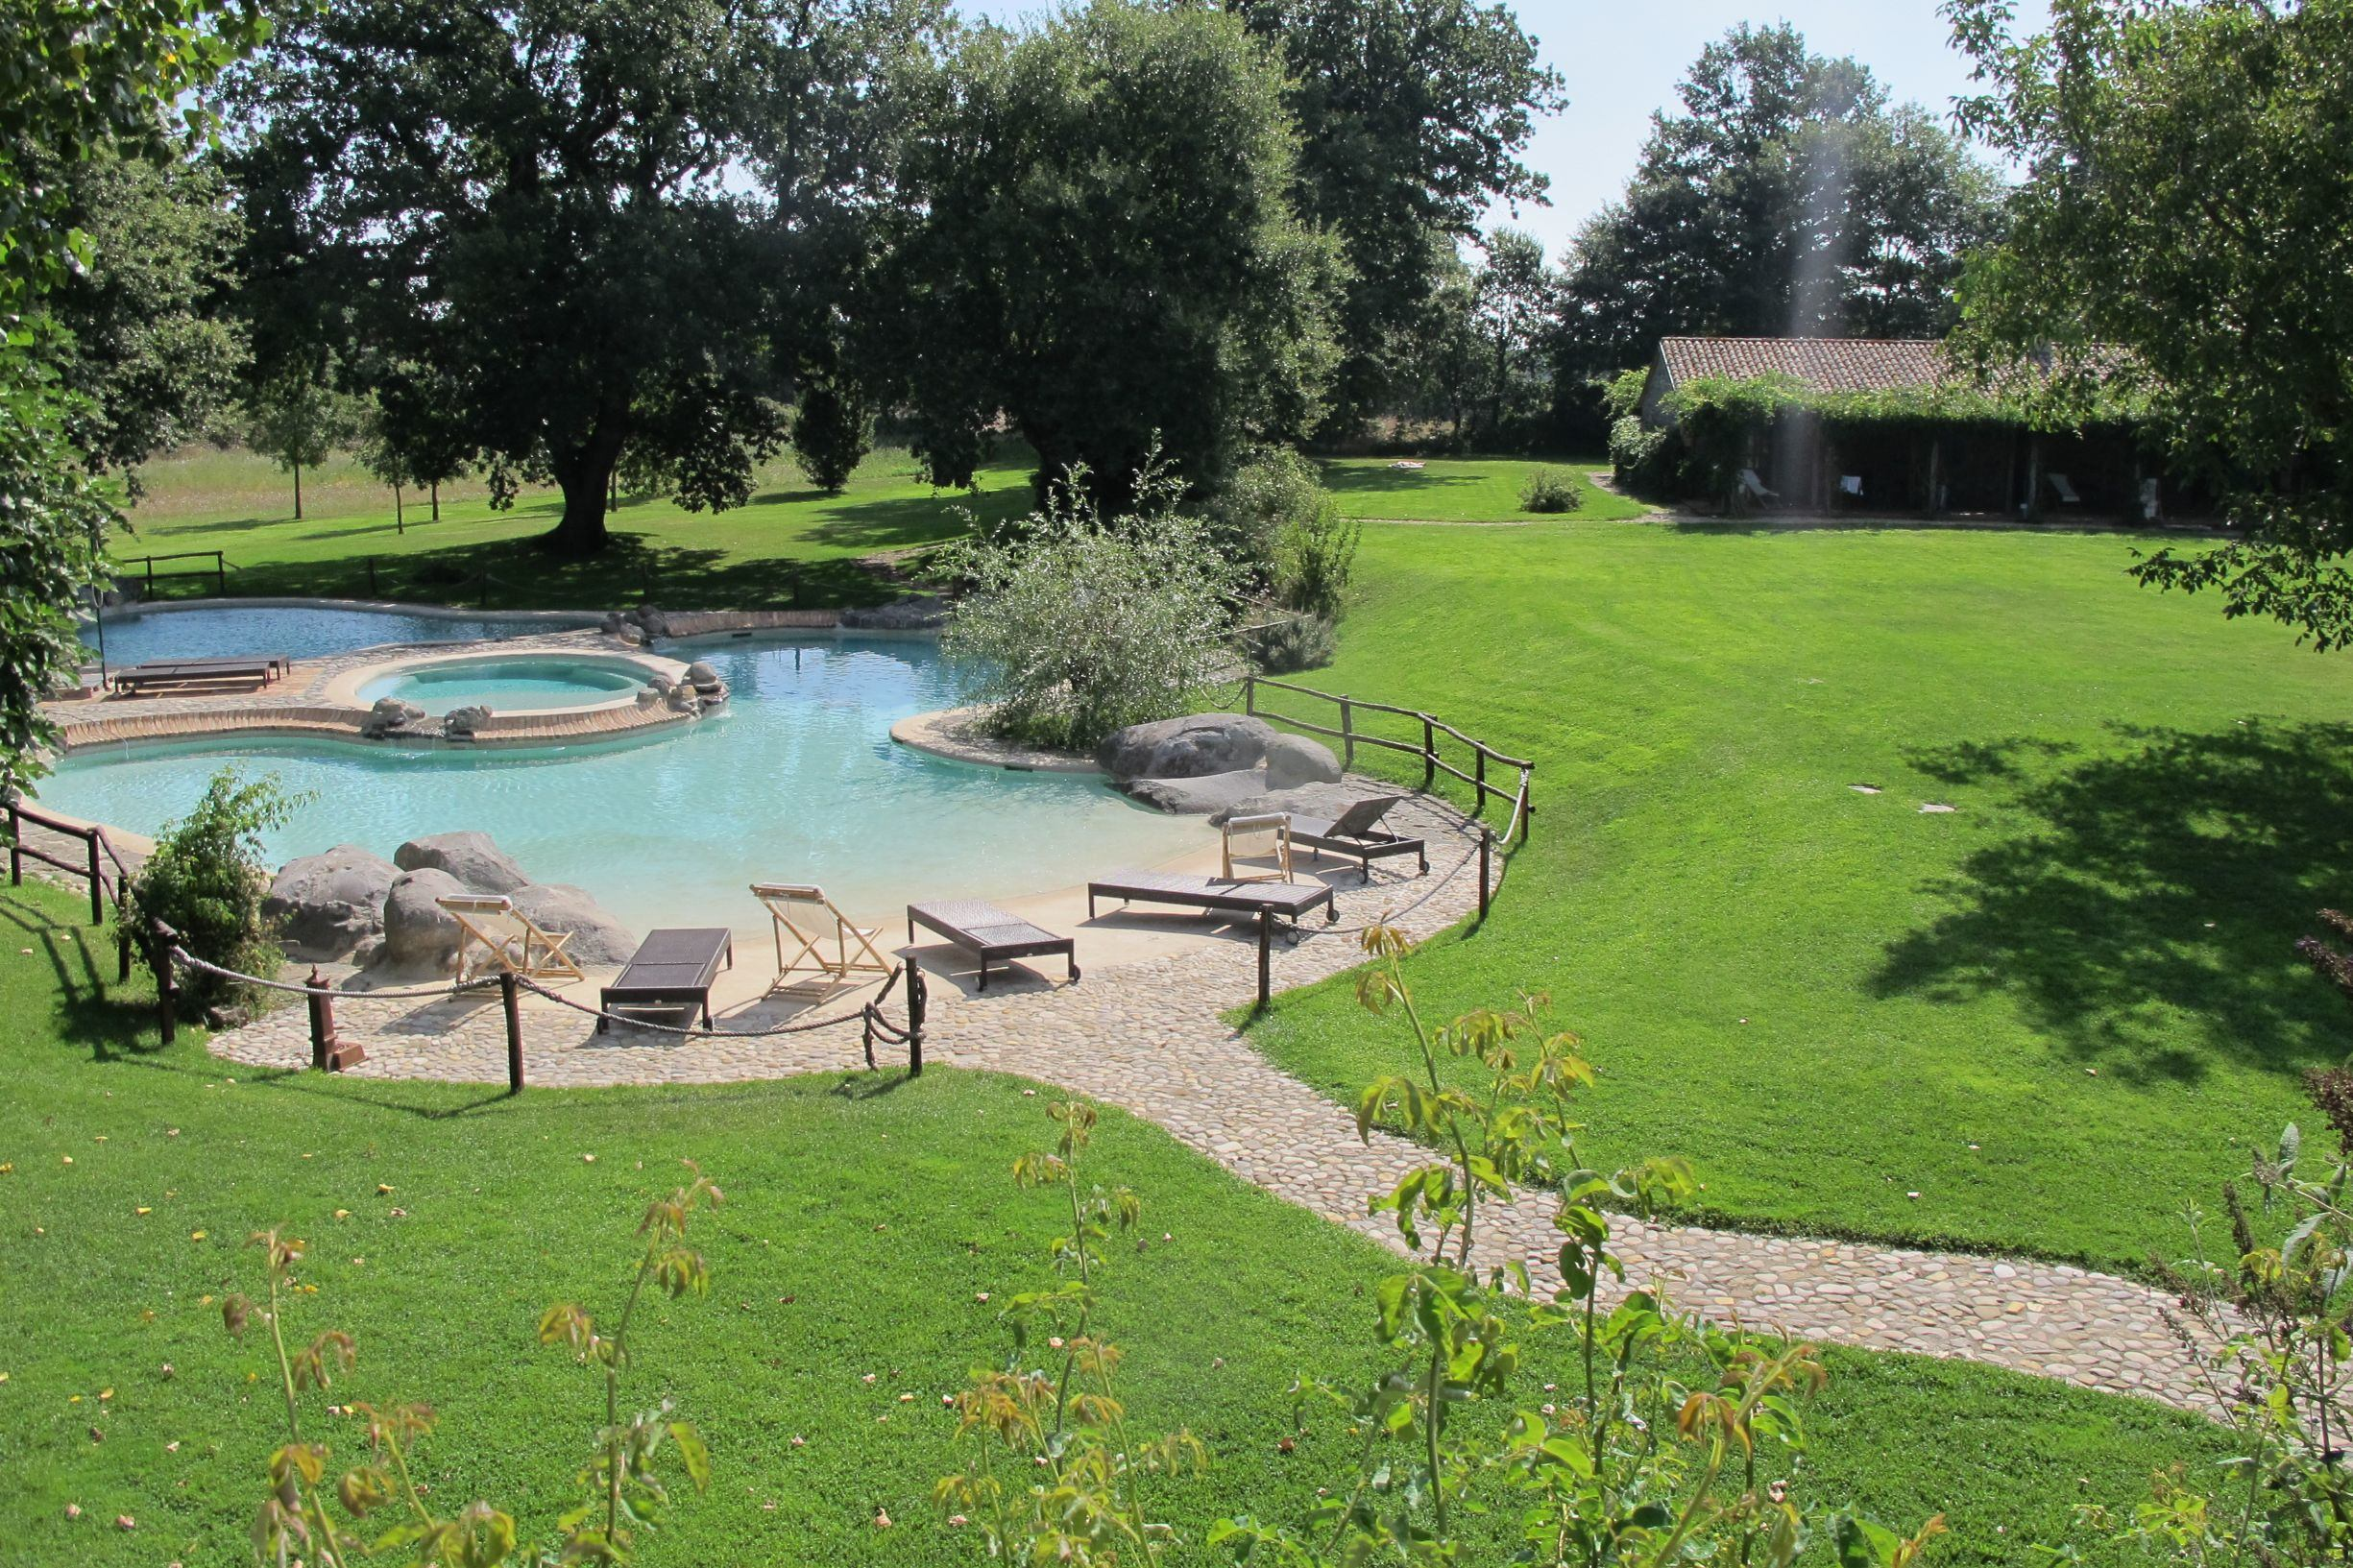 External pool and gardens at La Locanda